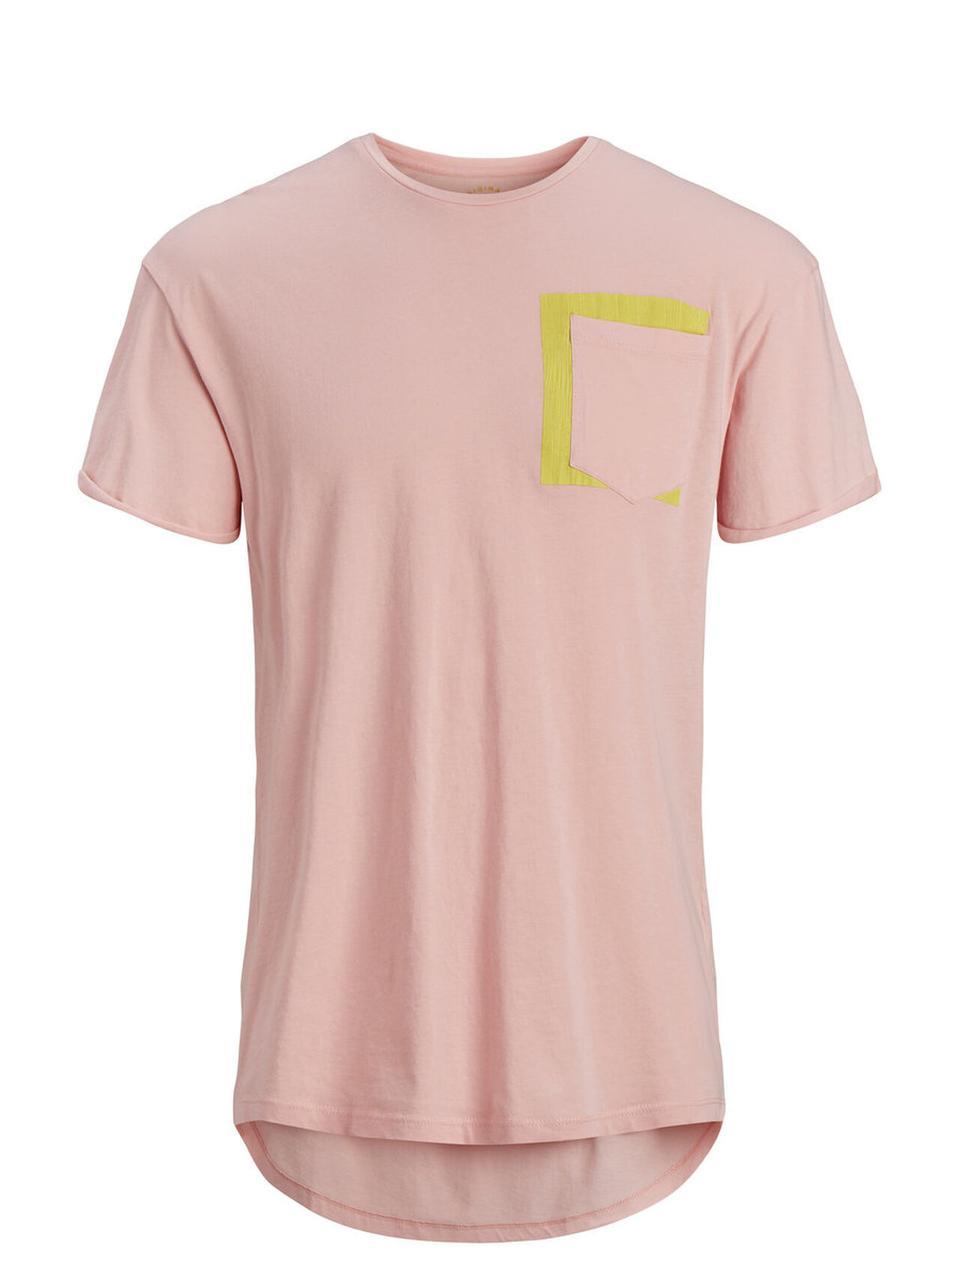 JACK&JONES Мужская футболка с карманом